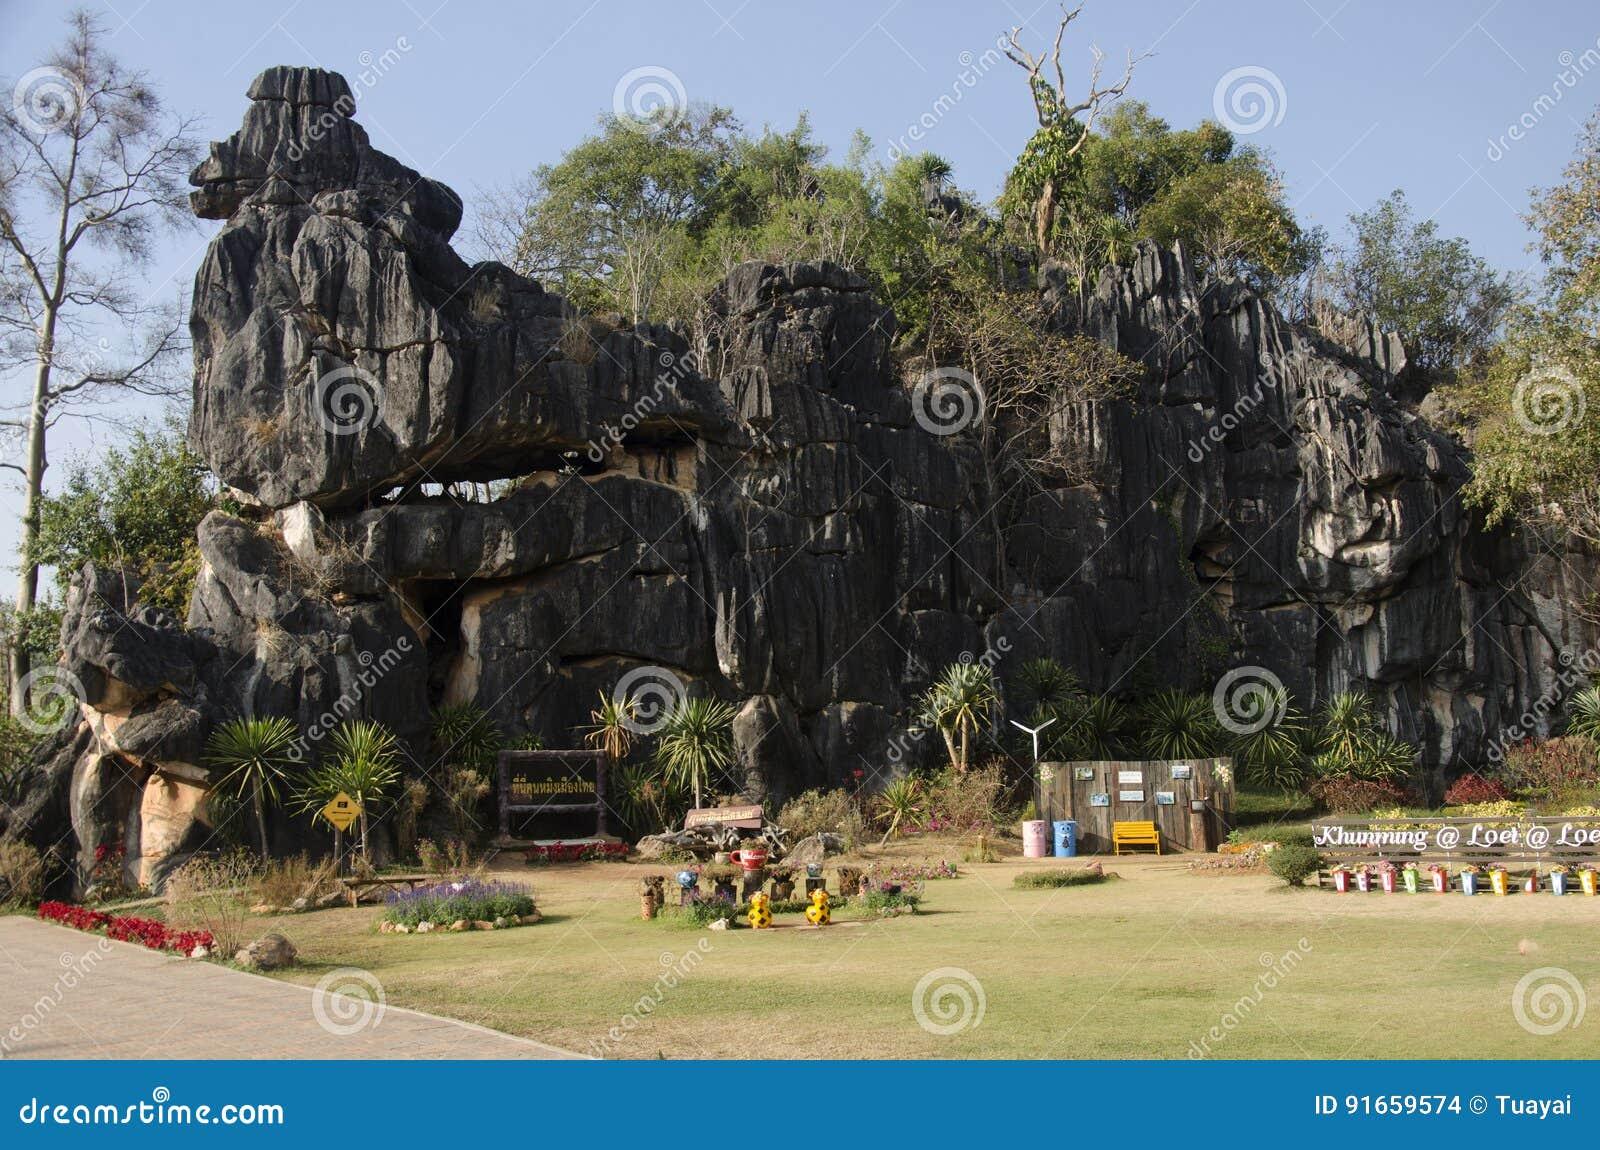 ` S Kunming de Suan Hin Pha Ngam o de Tailandia en el santuario de fauna de Phu Luang en Loei, Tailandia